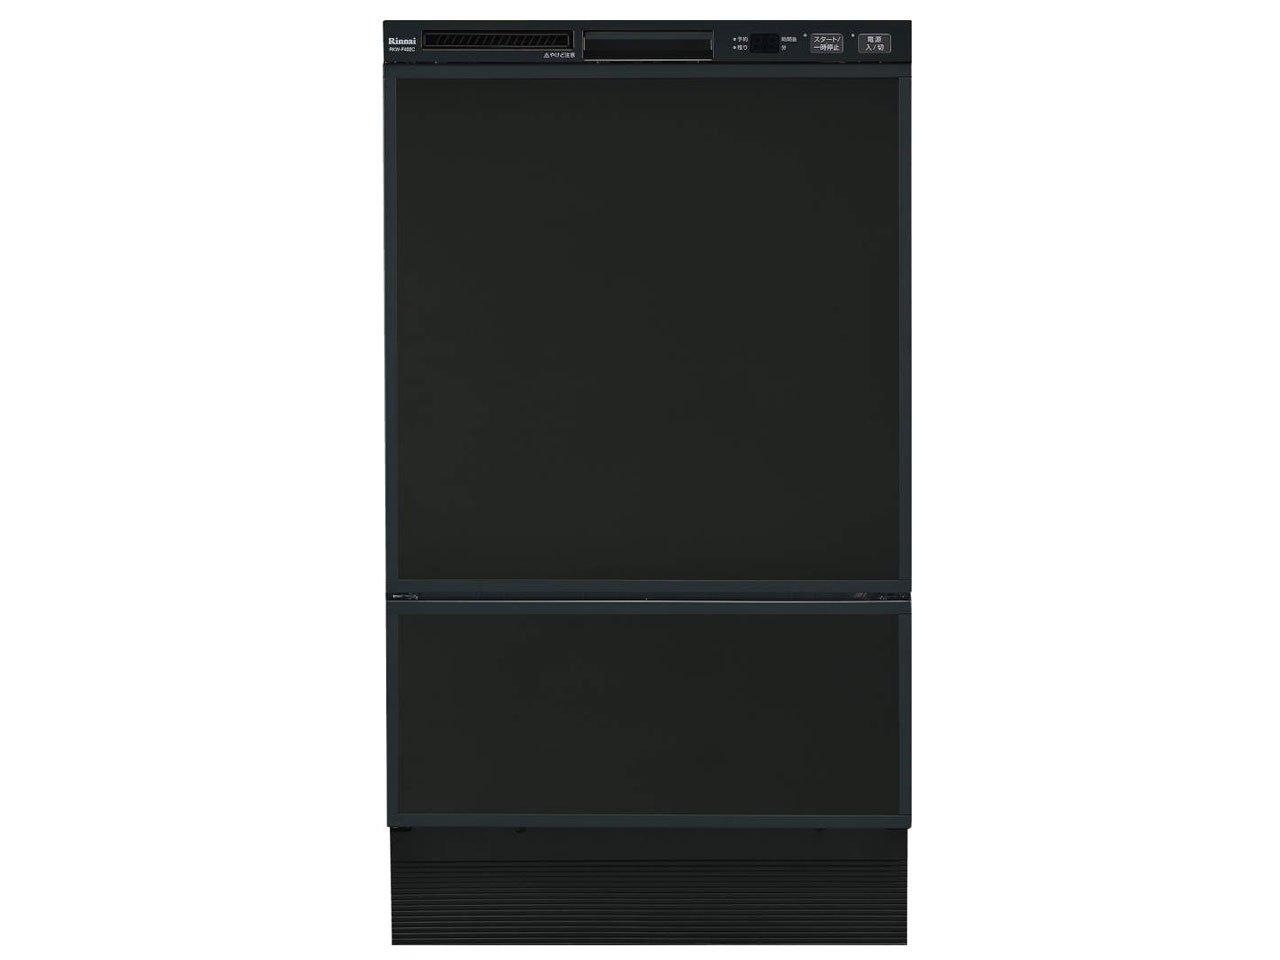 RSW-F402C-B B01NABBNLT ブラック(食器洗い乾燥機) B01NABBNLT, アルファオメガ:a1b2bbf0 --- lembahbougenville.com